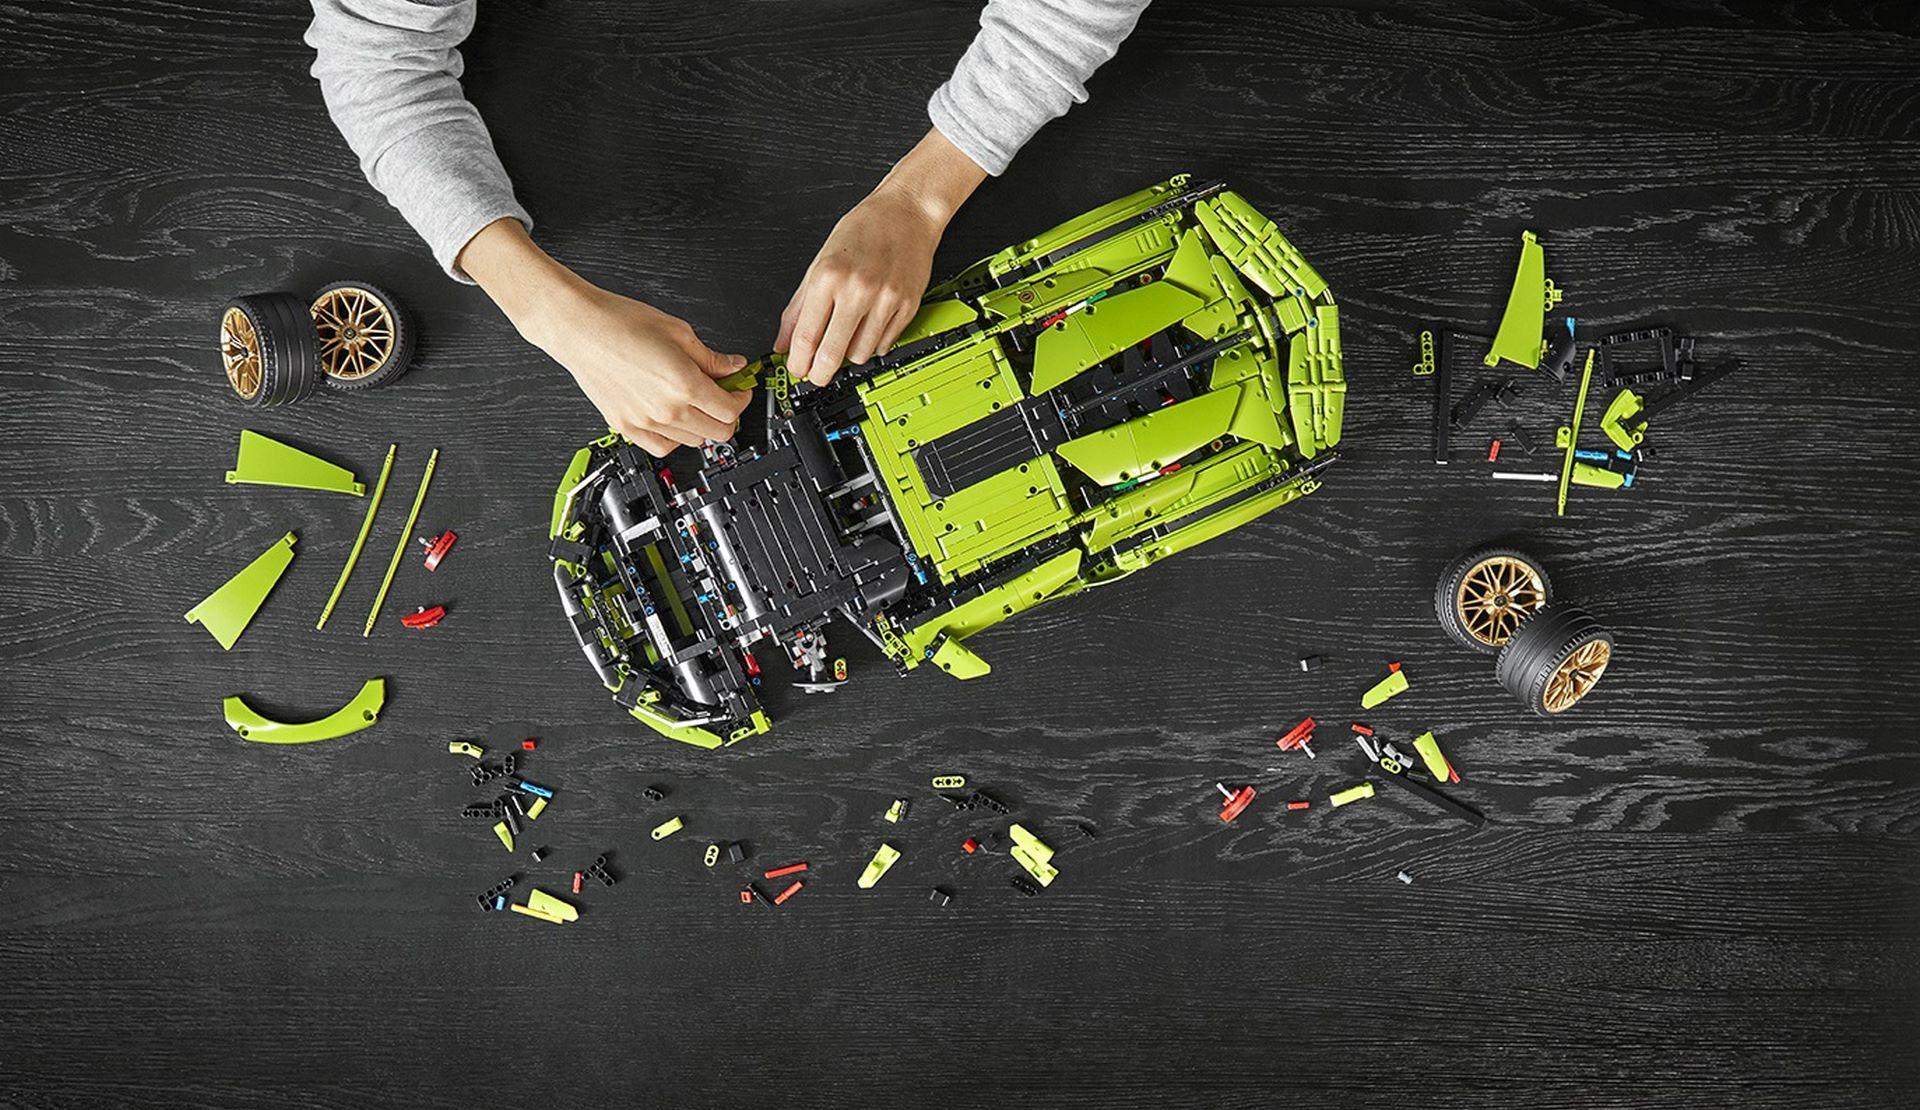 Lamborghini-Sian-FKP-37-Lego-Technic-8